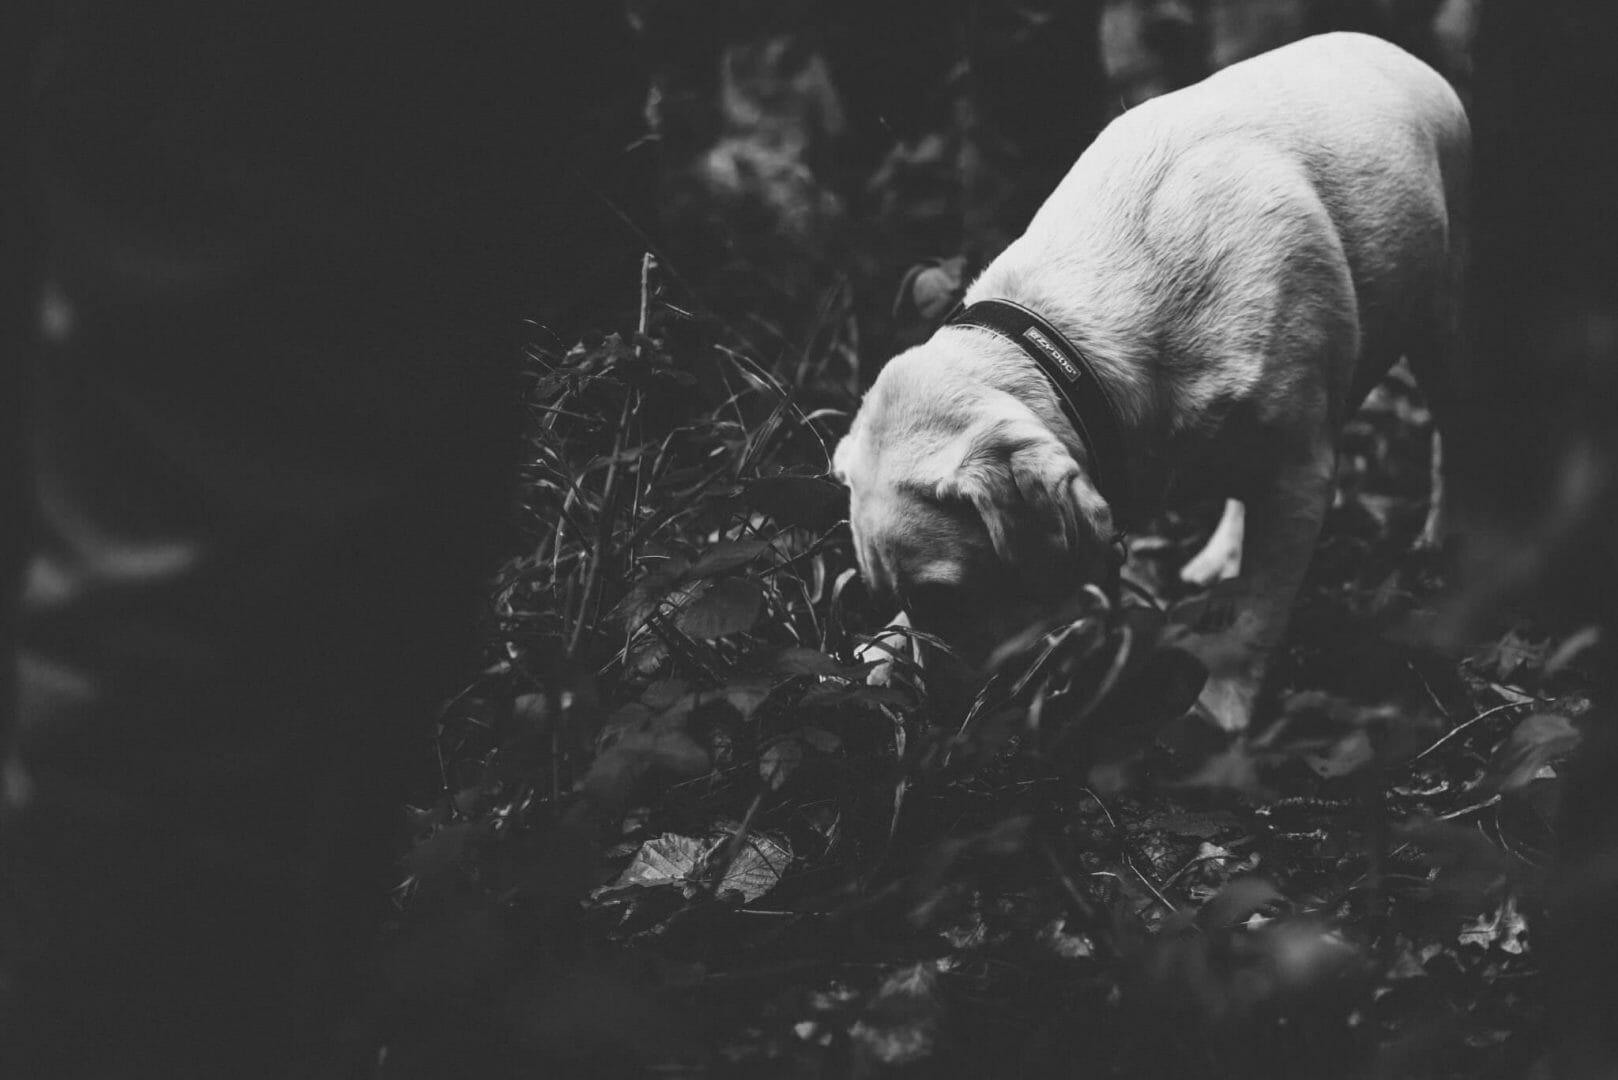 Hazel the PTSD dog